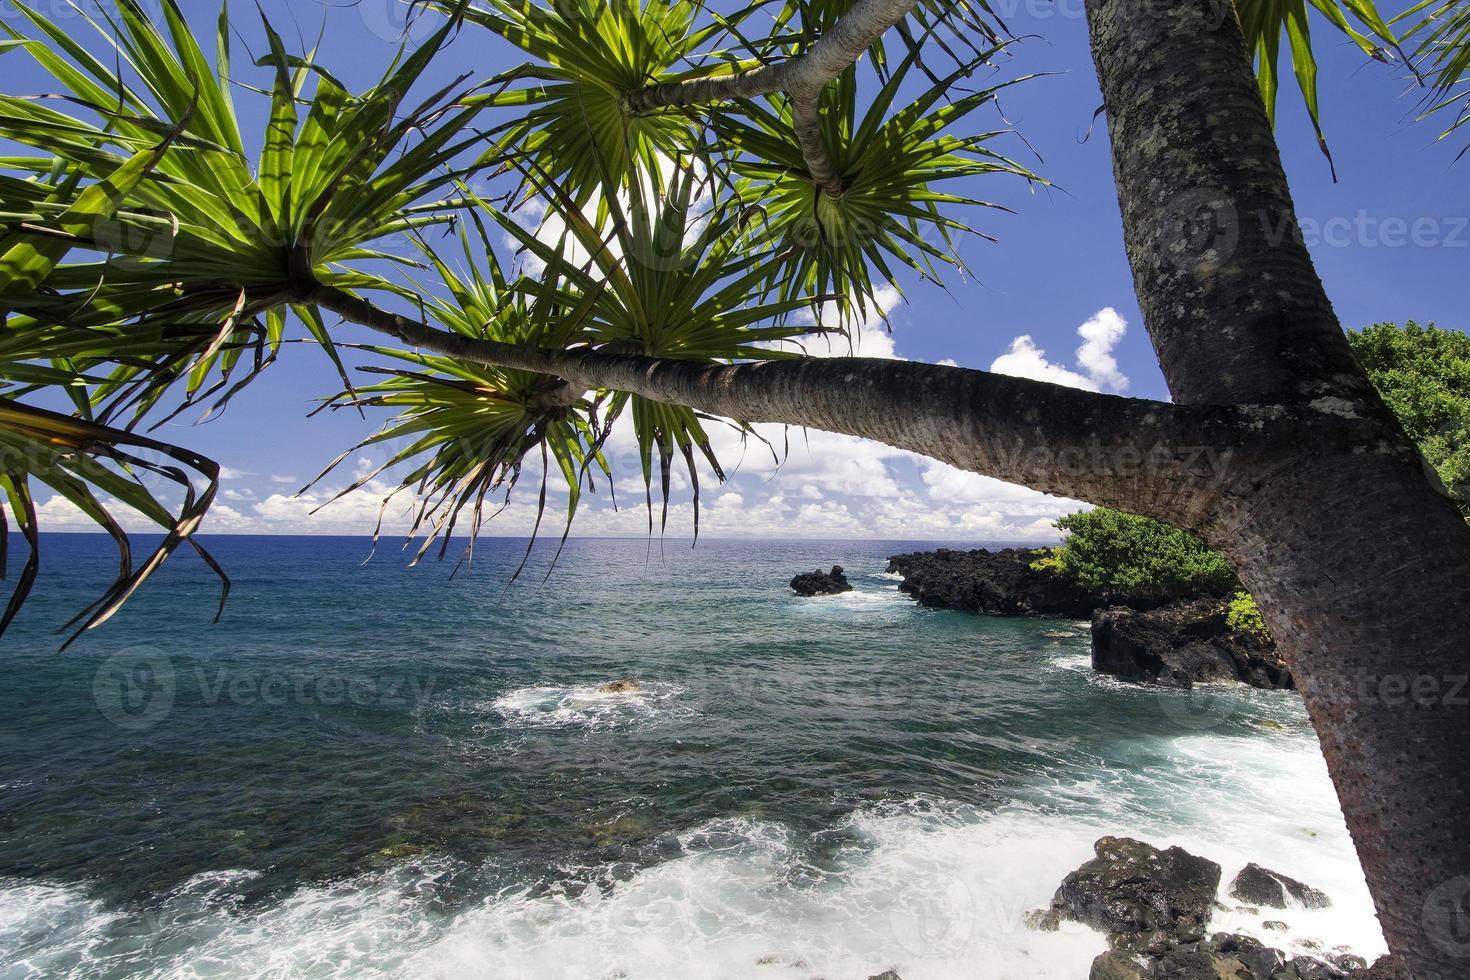 Palme, Nordküste, Straße nach Hana, Maui, Hawaii foto